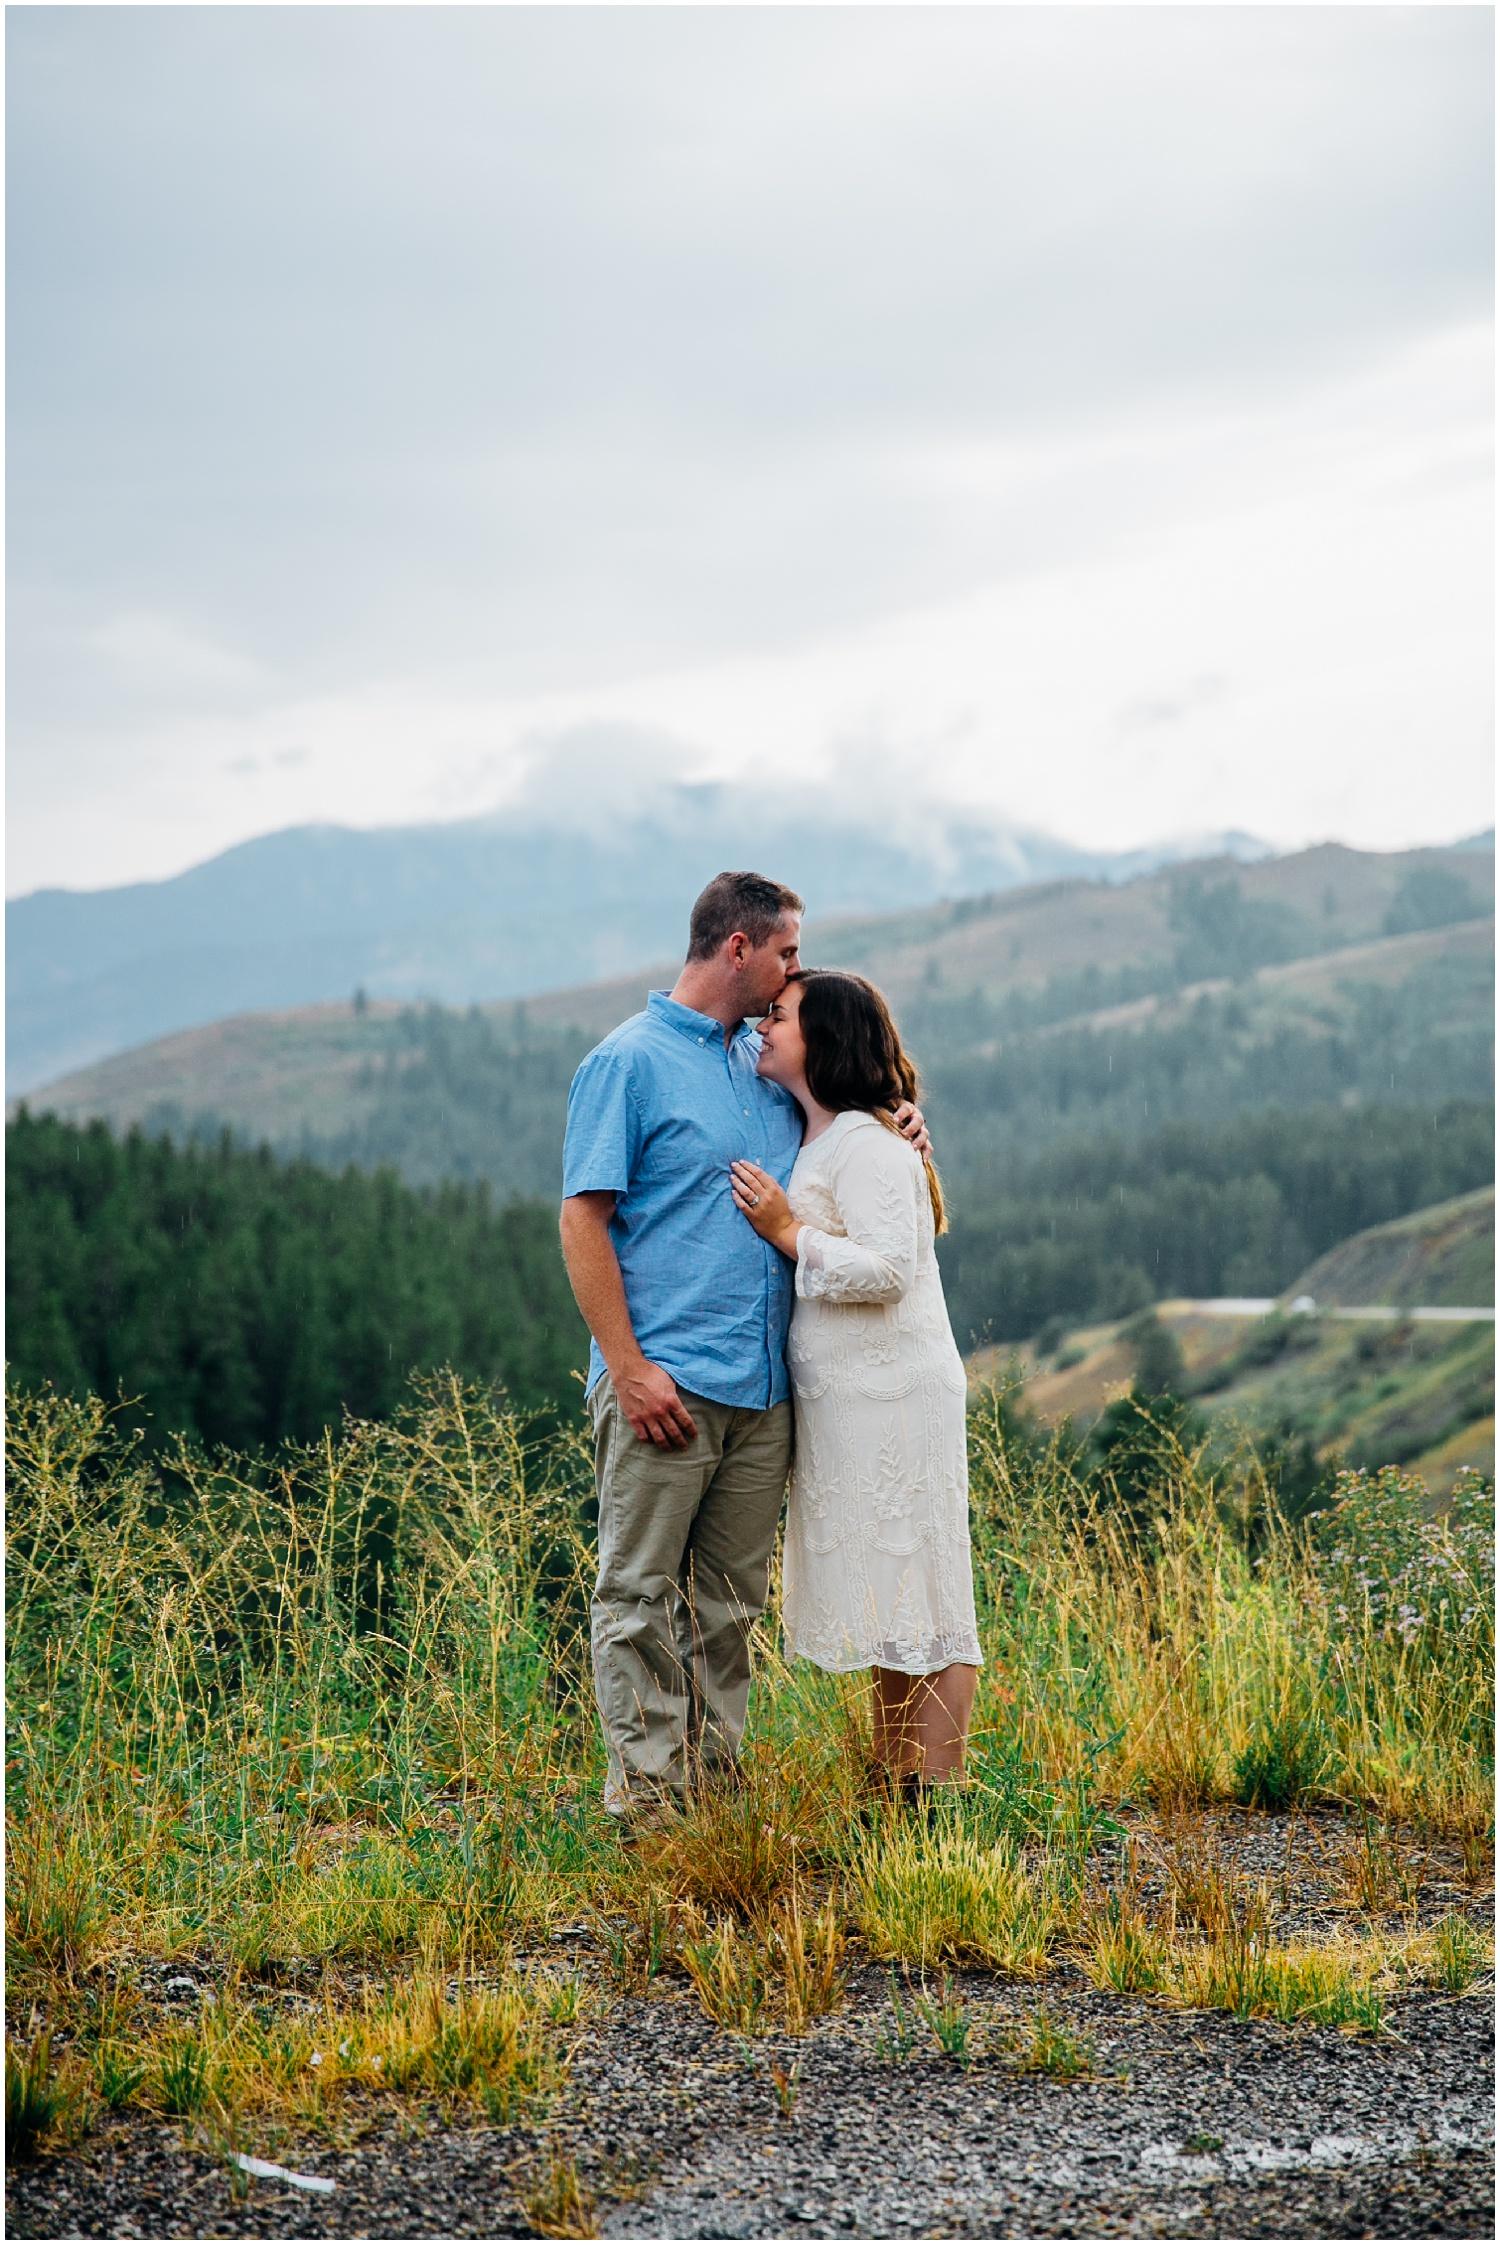 swan-valley-jackson-wyoming-engagements-idaho-colorado-wyoming-wedding-photographer_0901.jpg